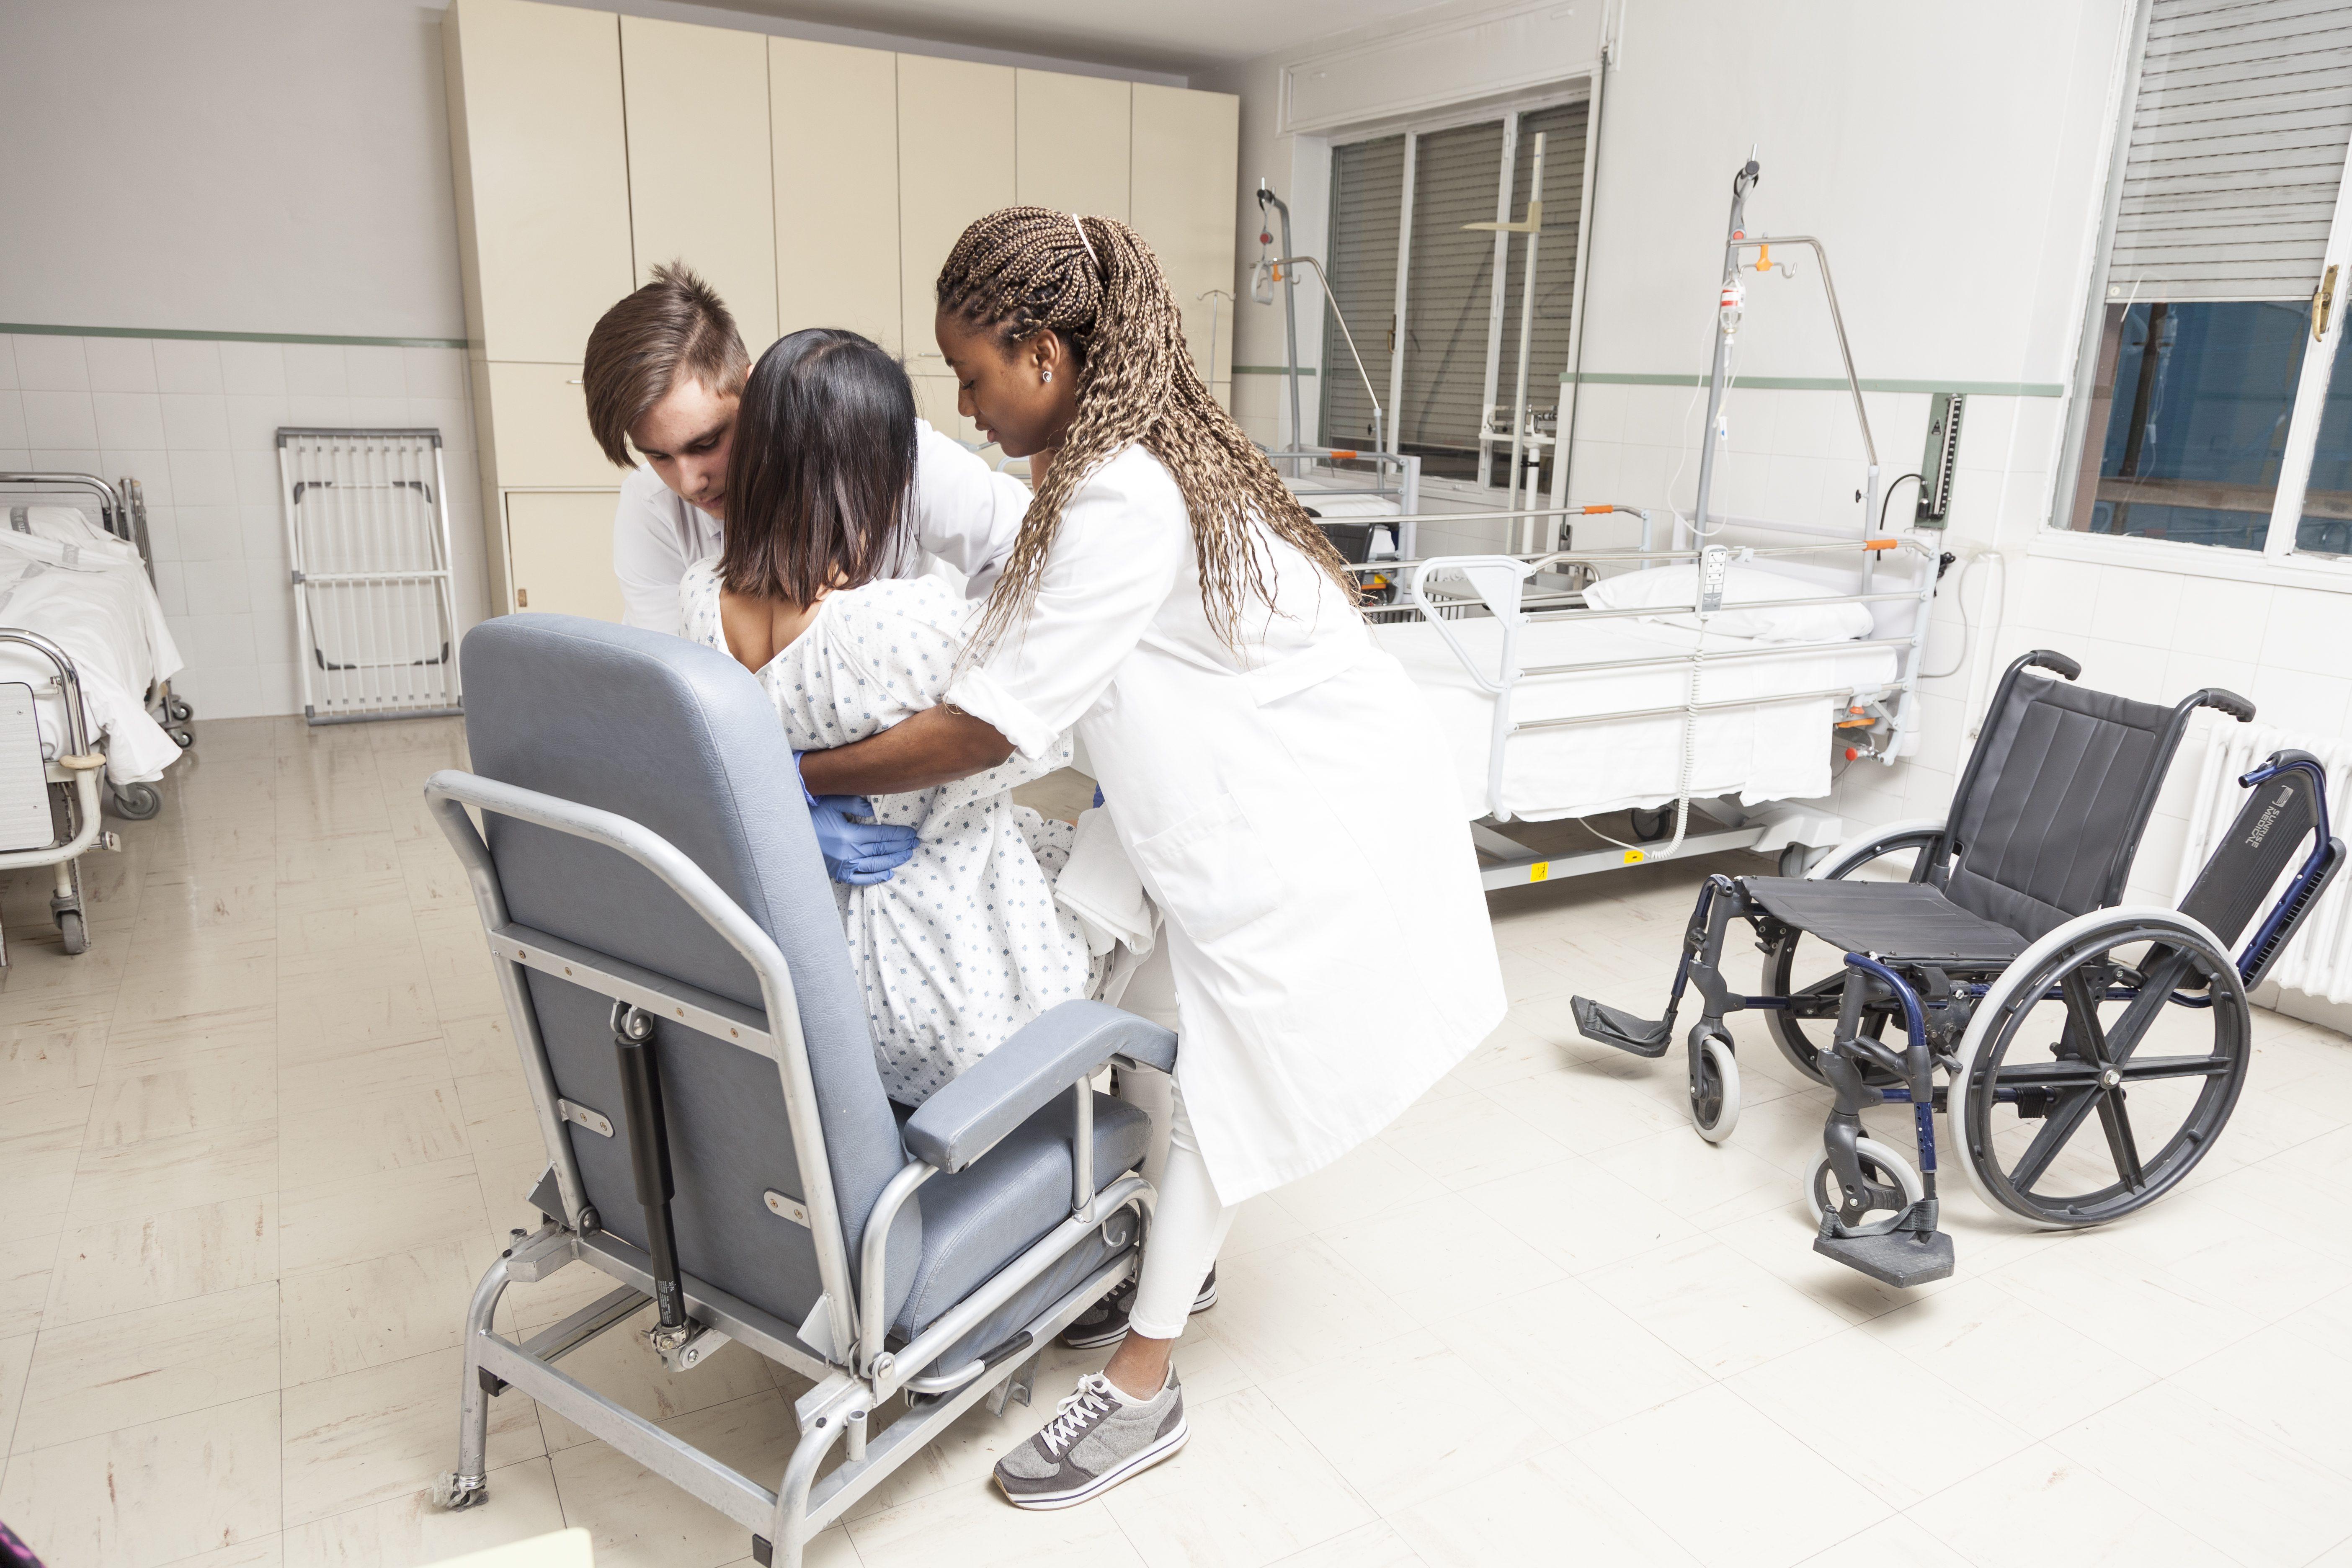 Centro de referencia nacional Escuela Sanitaria (25)